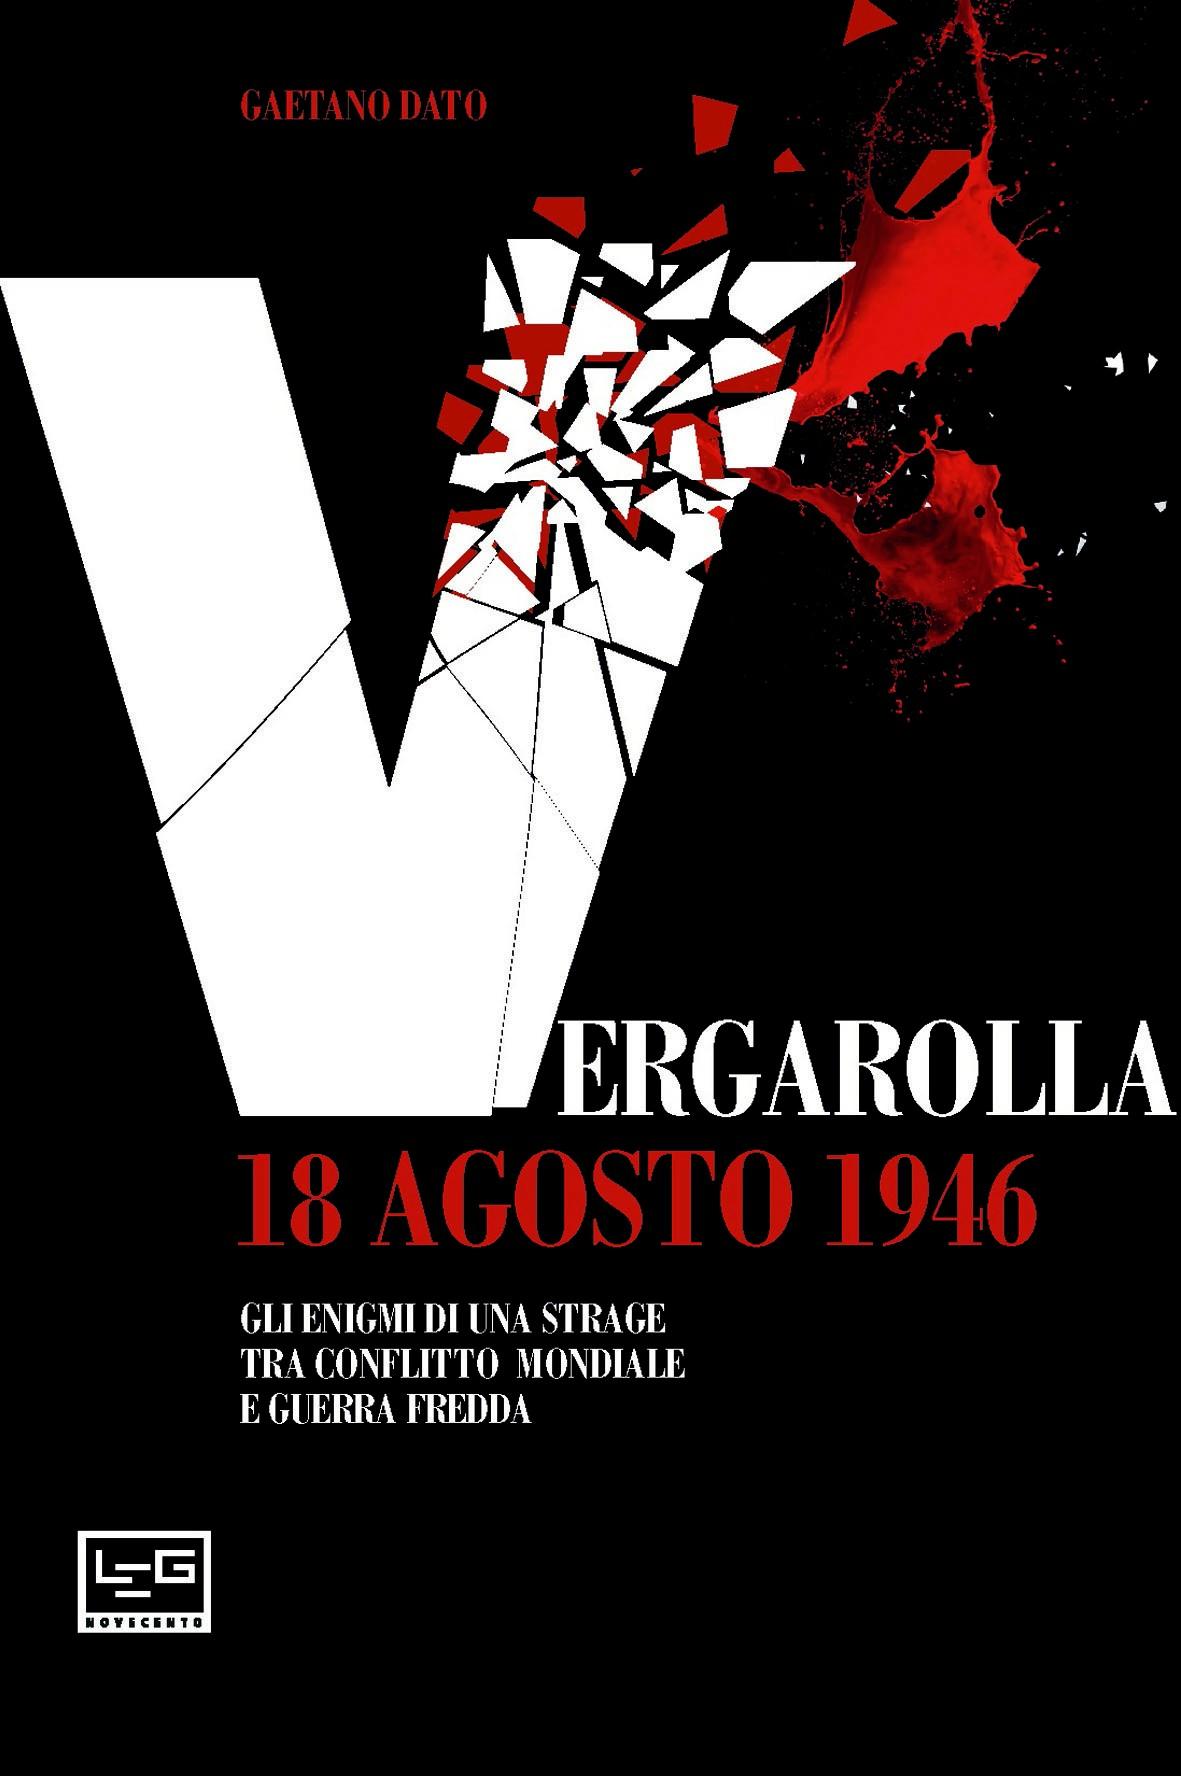 Vergarolla, 18 agosto 1946